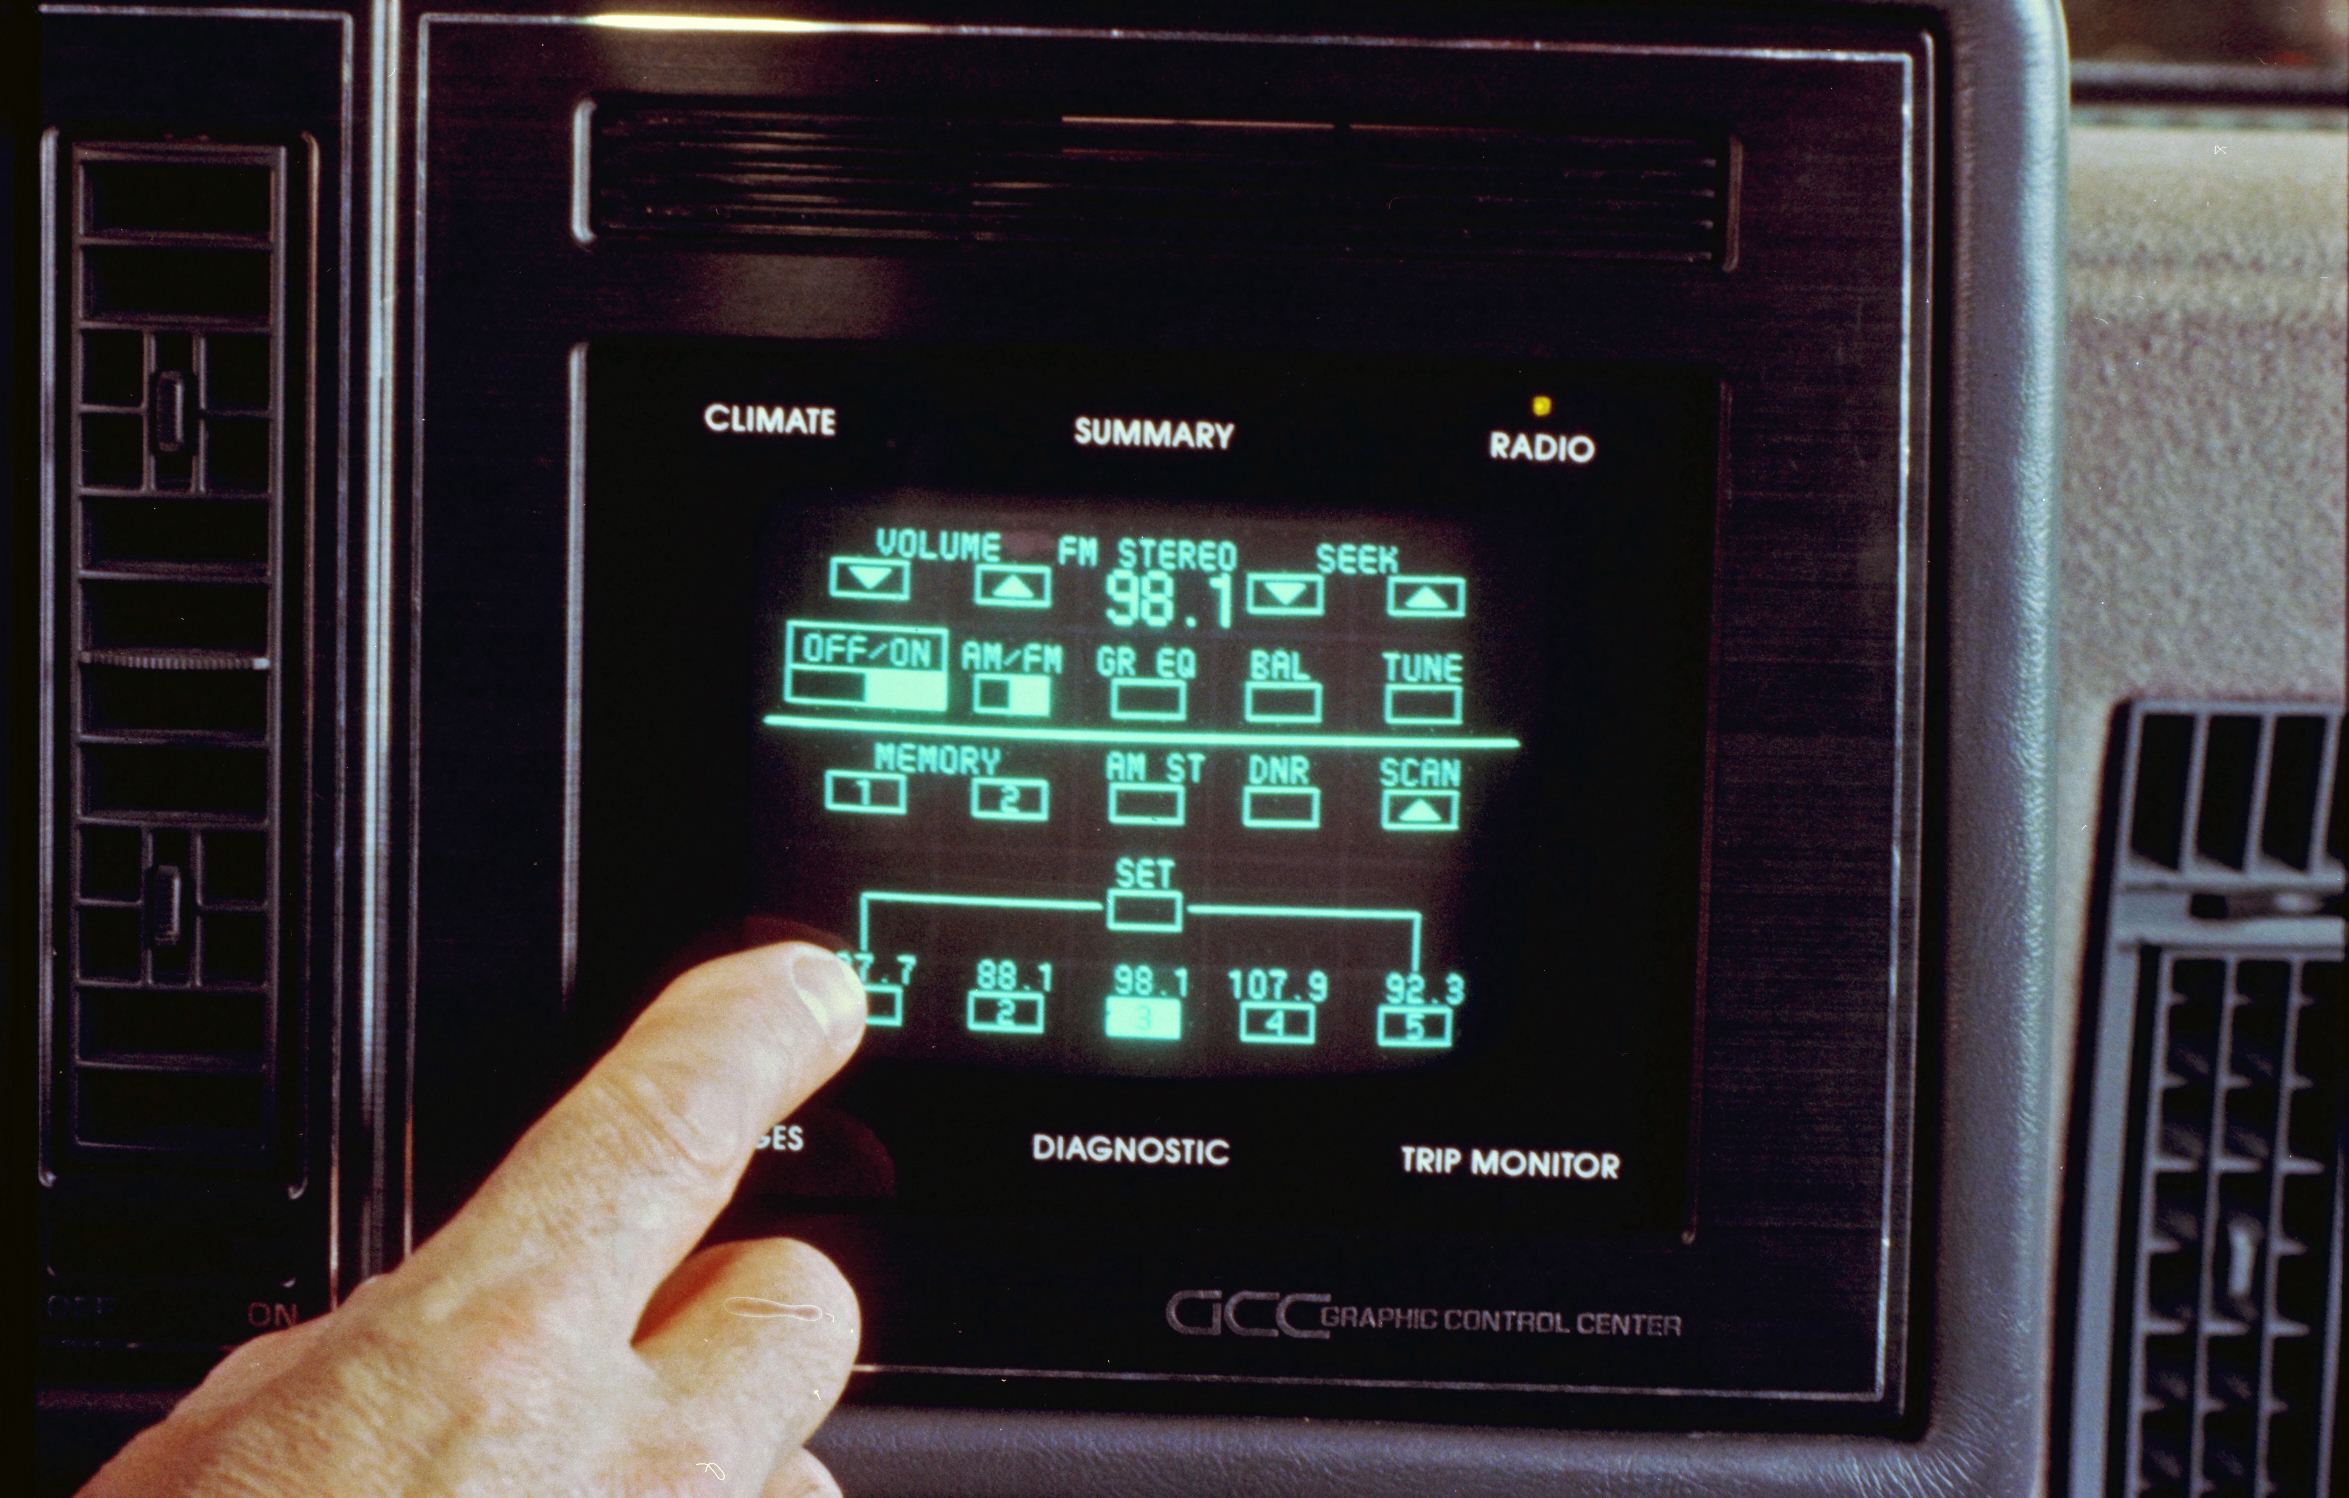 1986 Buick Riviera GCC Touchscreen radio